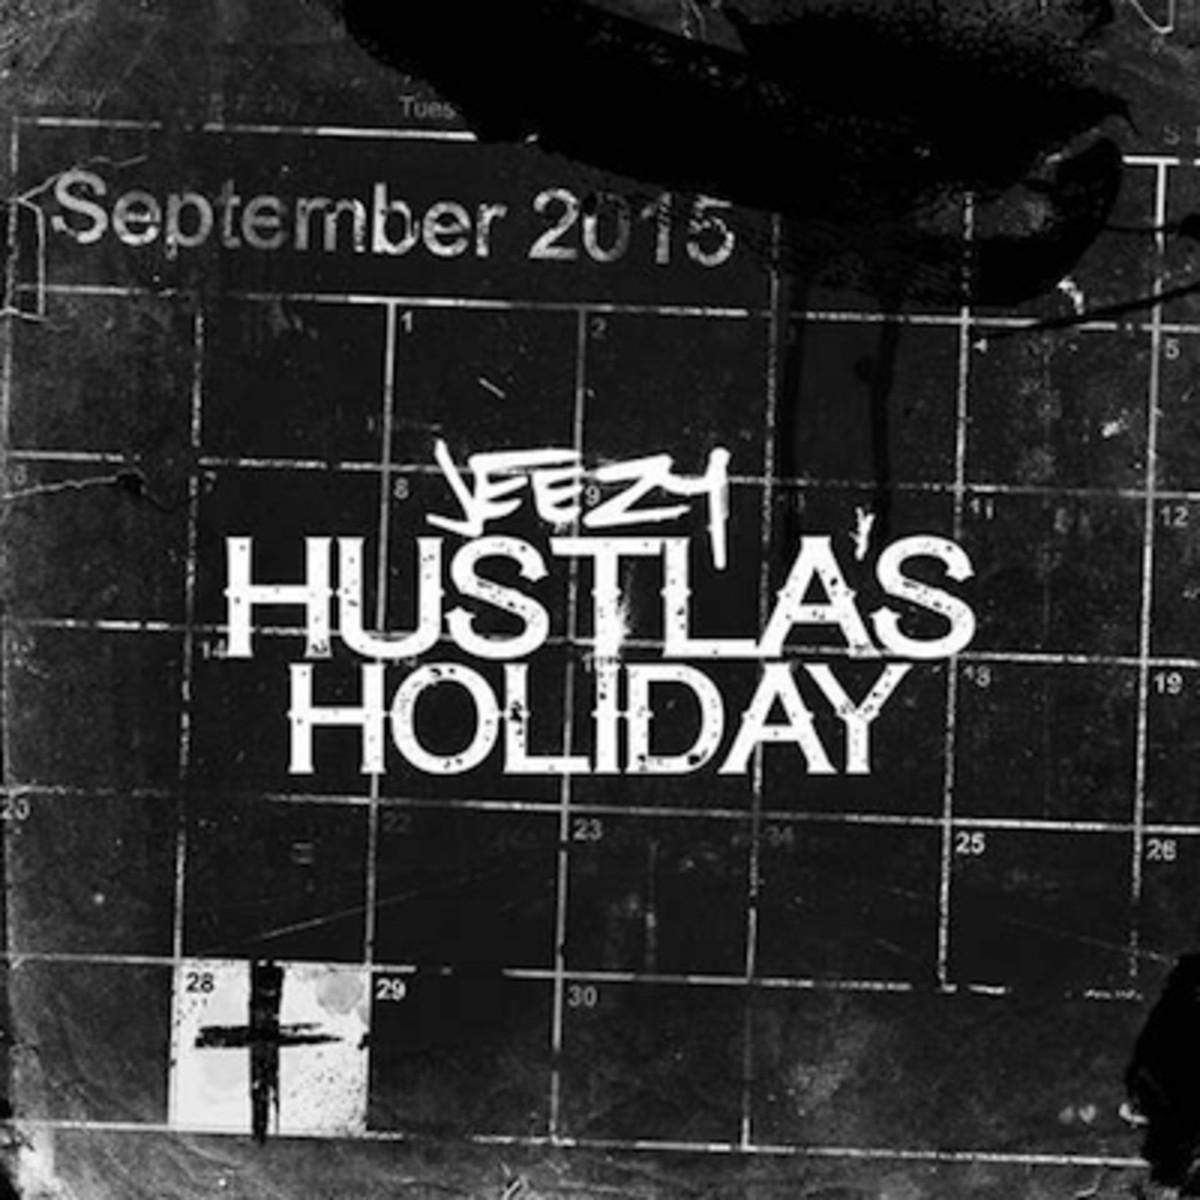 jeezy-hustlas-holiday.jpg